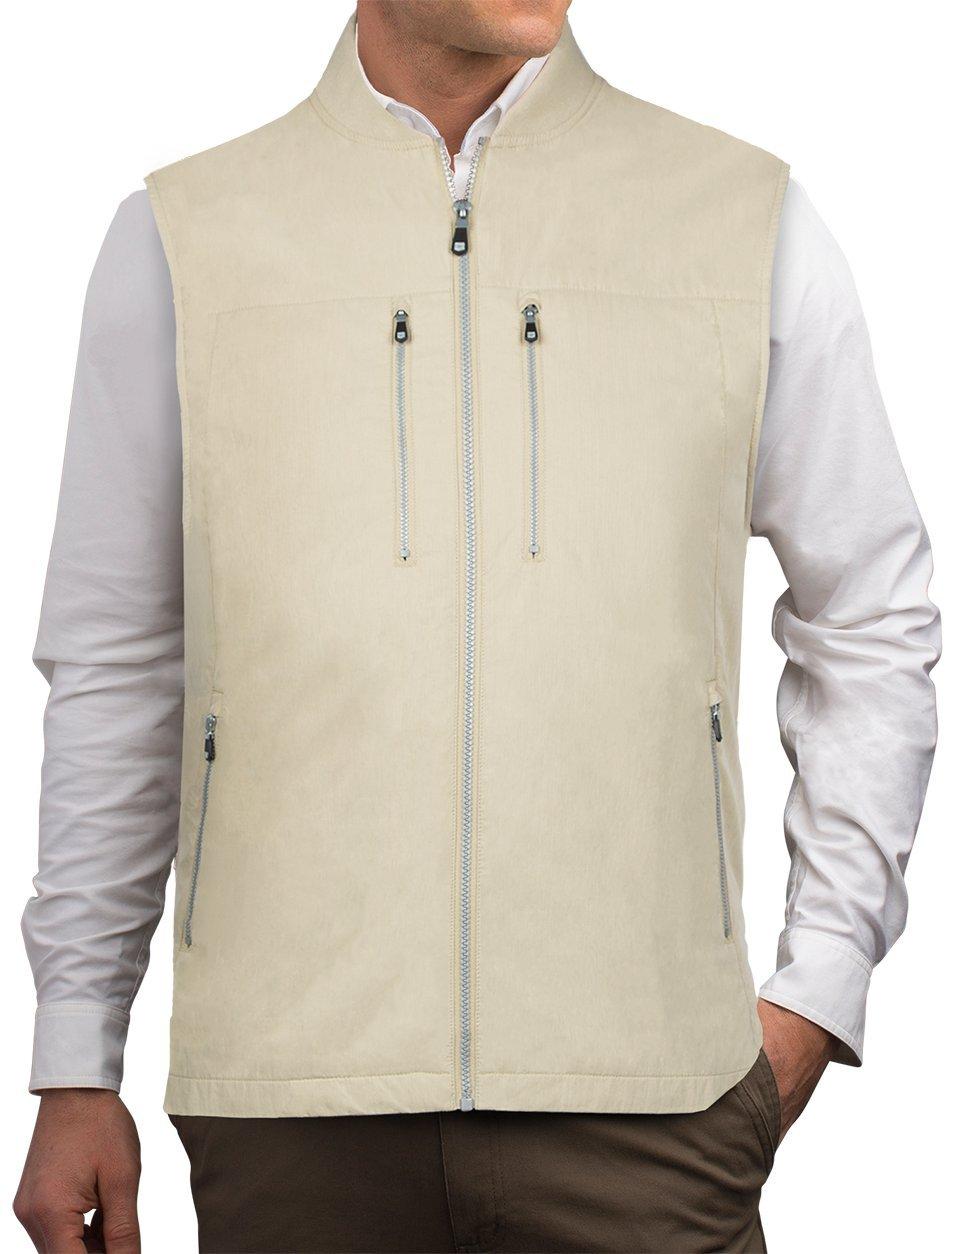 SCOTTeVEST 101 Vest-Men's - 9 Pockets, Travel Clothing, KHA, M